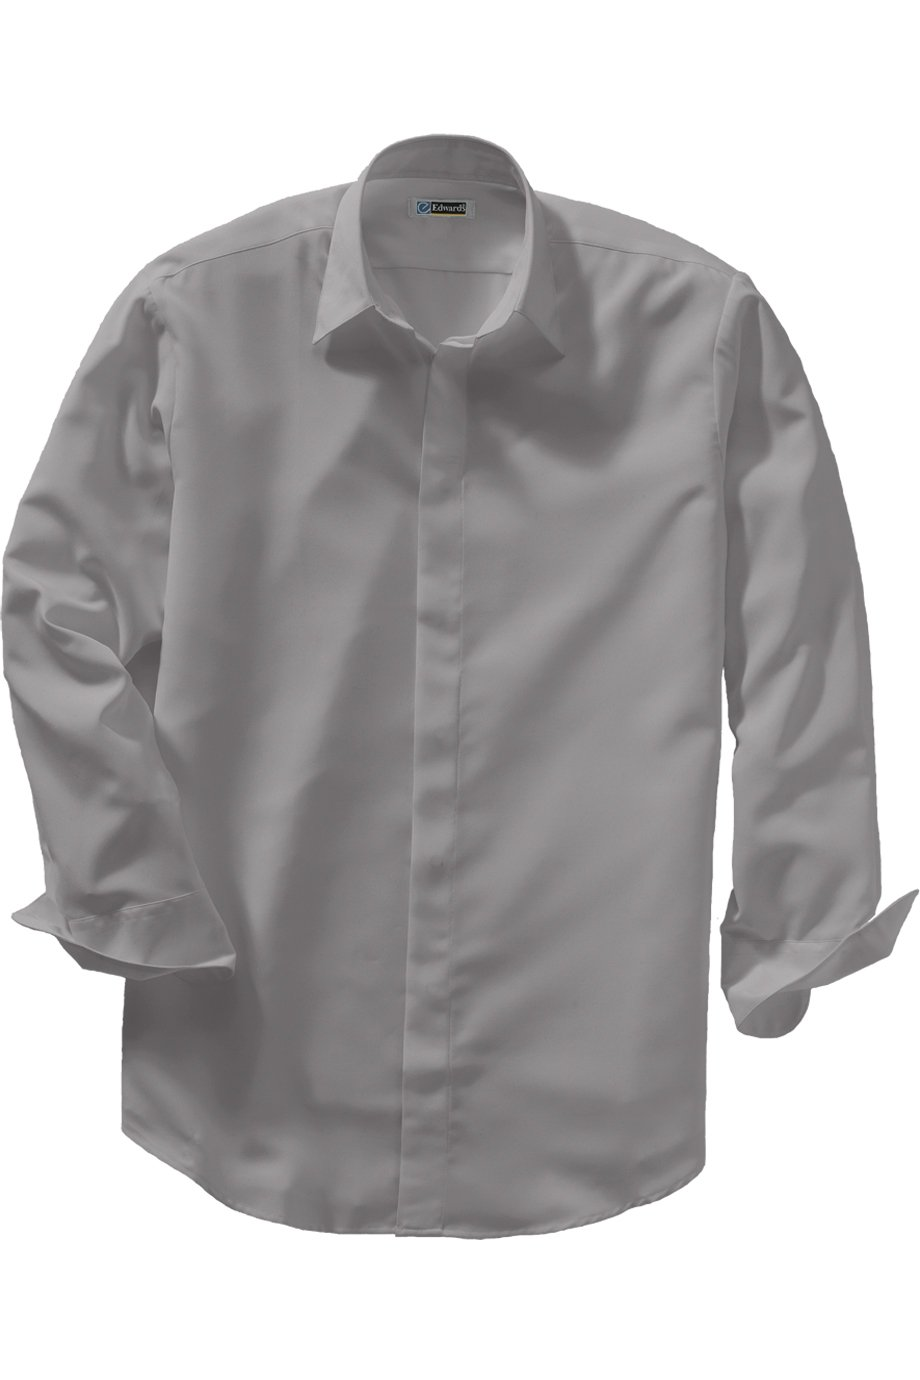 Edwards Garment Men's Big And Tall Adjustable Cuff Cafe Shirt_PLATINUM_XXXXX-Large Tall by Edwards Garment